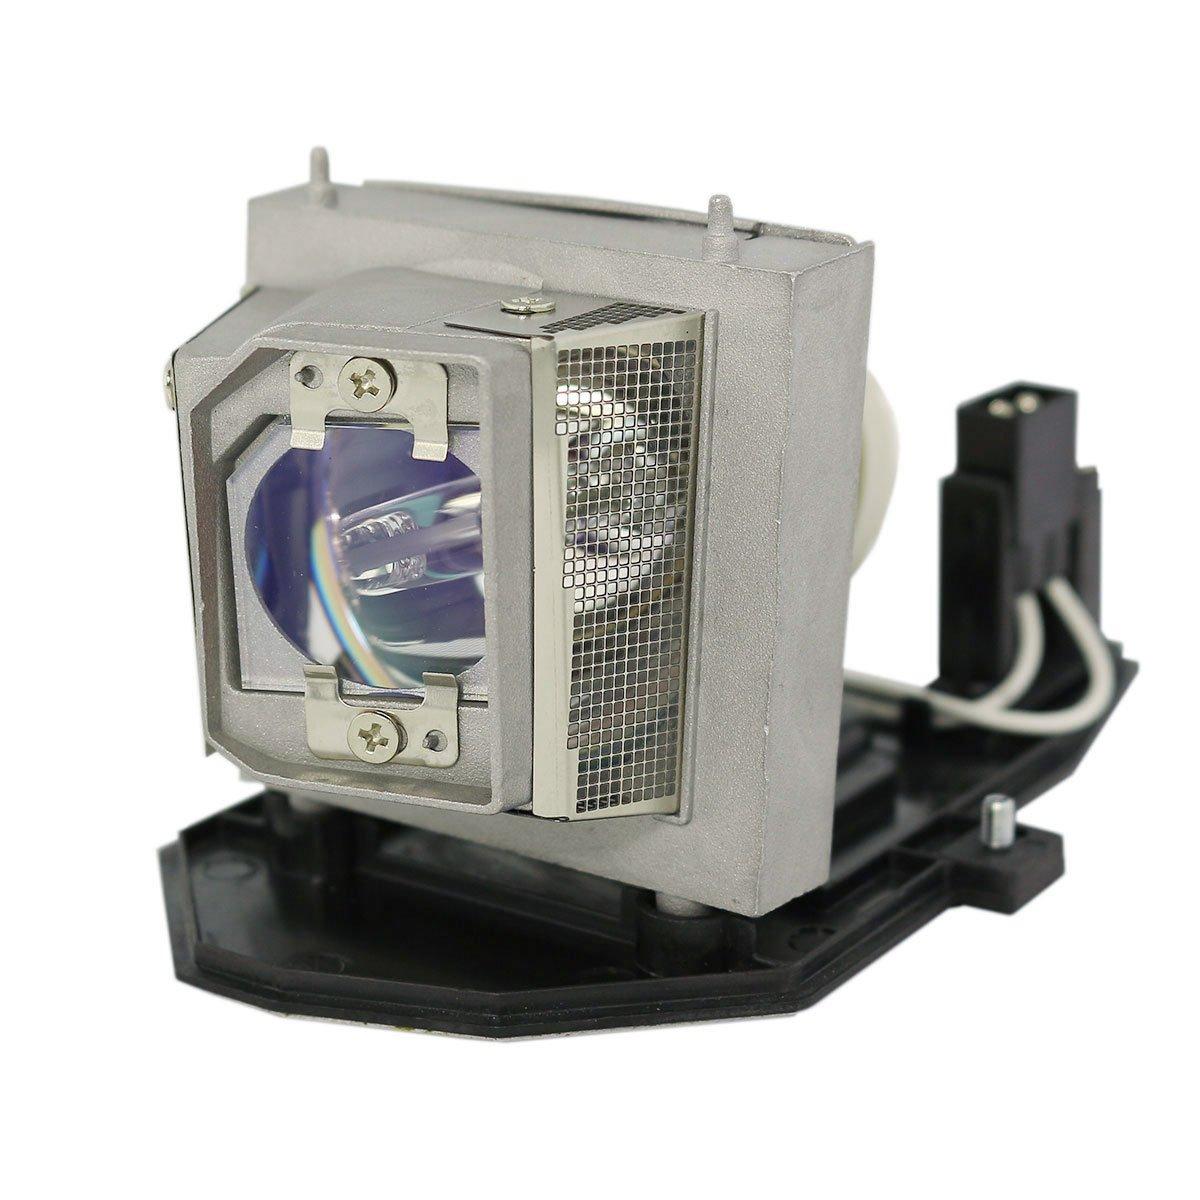 SpArc Platinum for Panasonic PT-LX321 Projector Lamp with Enclosure (Original Philips Bulb Inside)